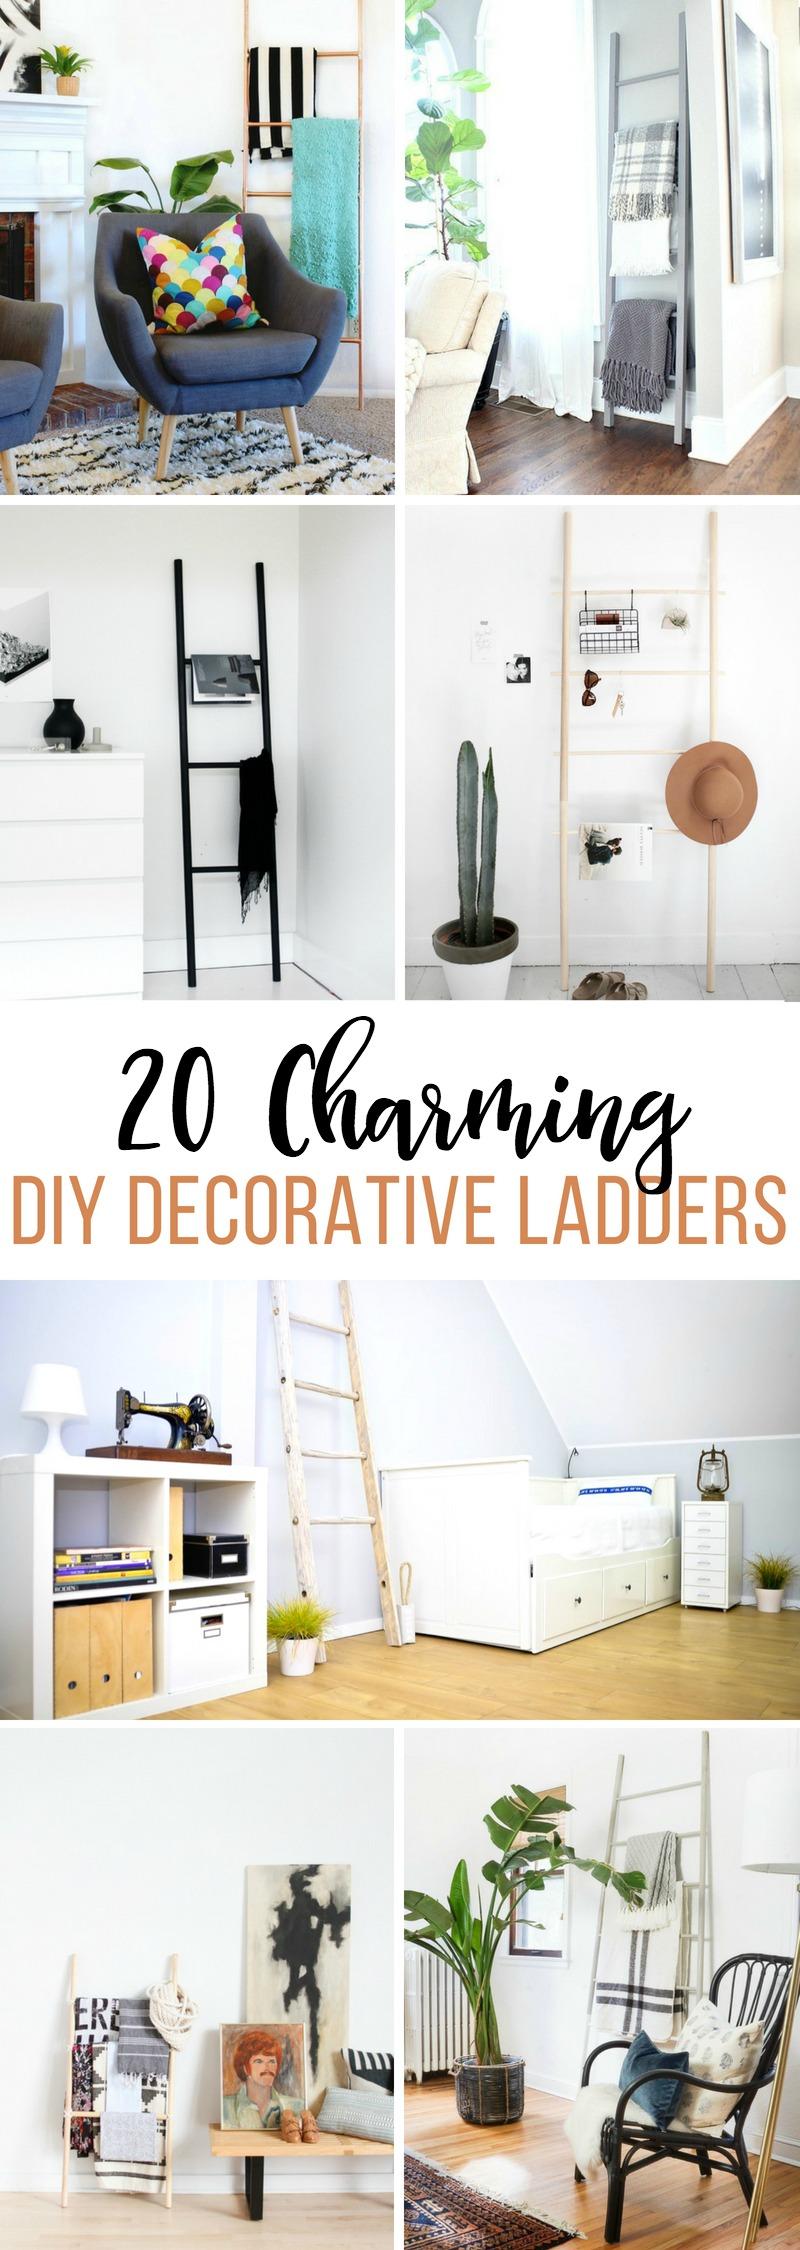 20 Charming DIY Decorative Ladders